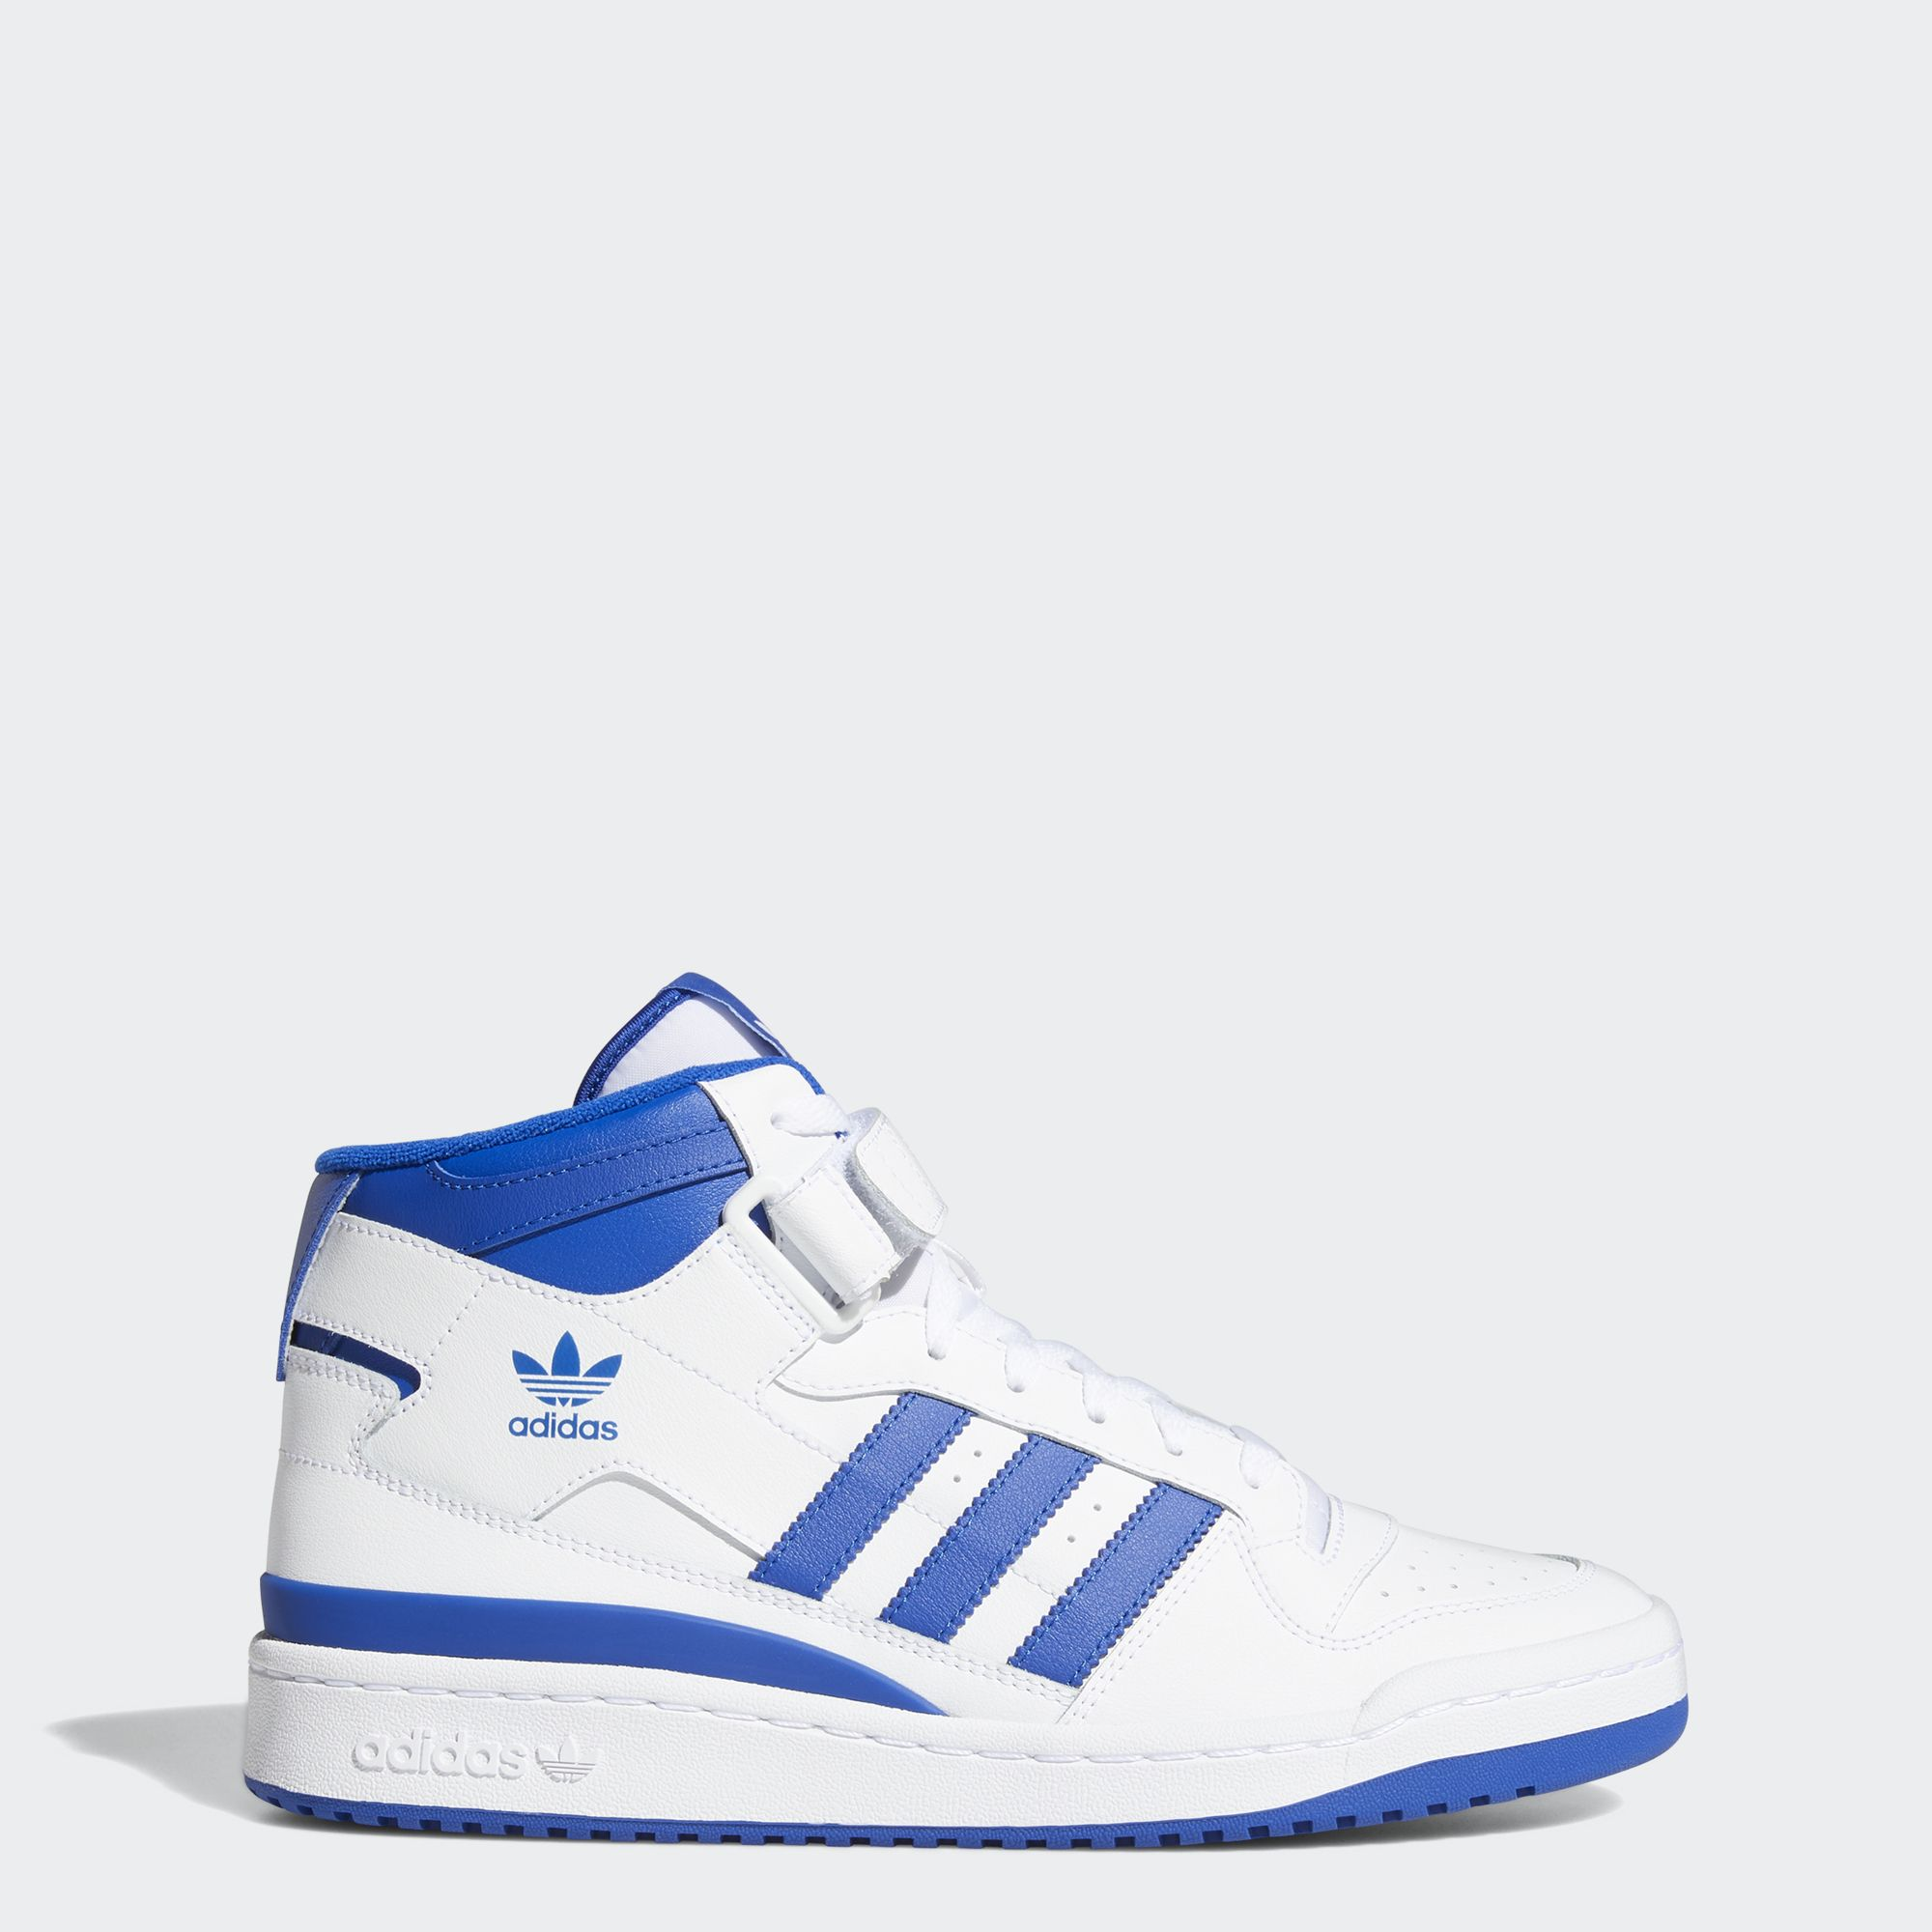 adidas ORIGINALS รองเท้า Forum Mid ผู้ชาย สีขาว FY4976